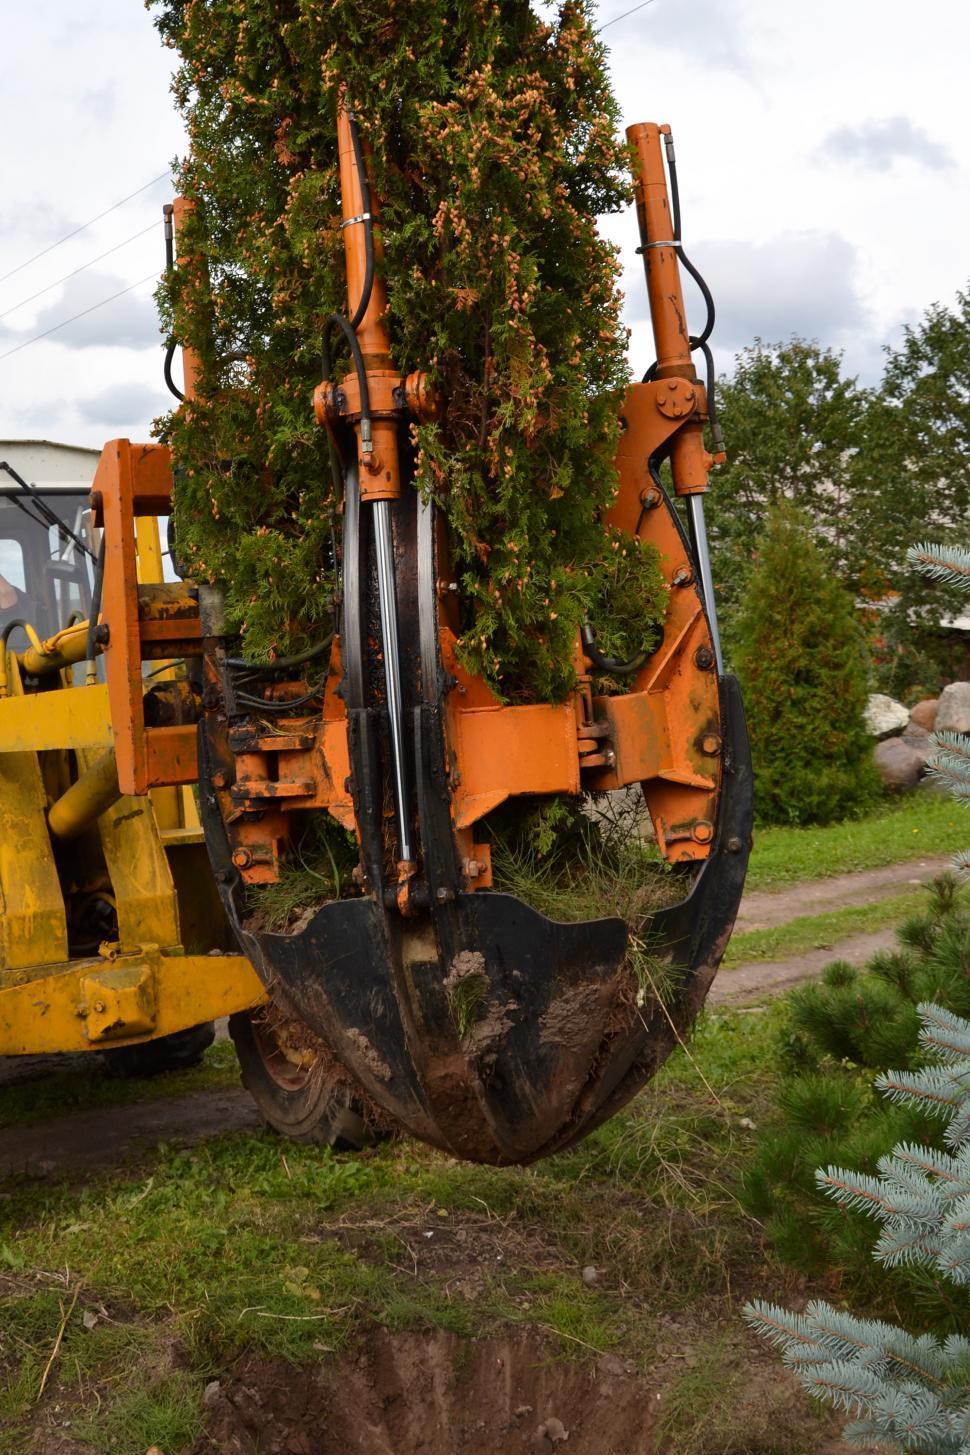 Download Free Stock HD Photo of Tree Transplanting Equipment Online